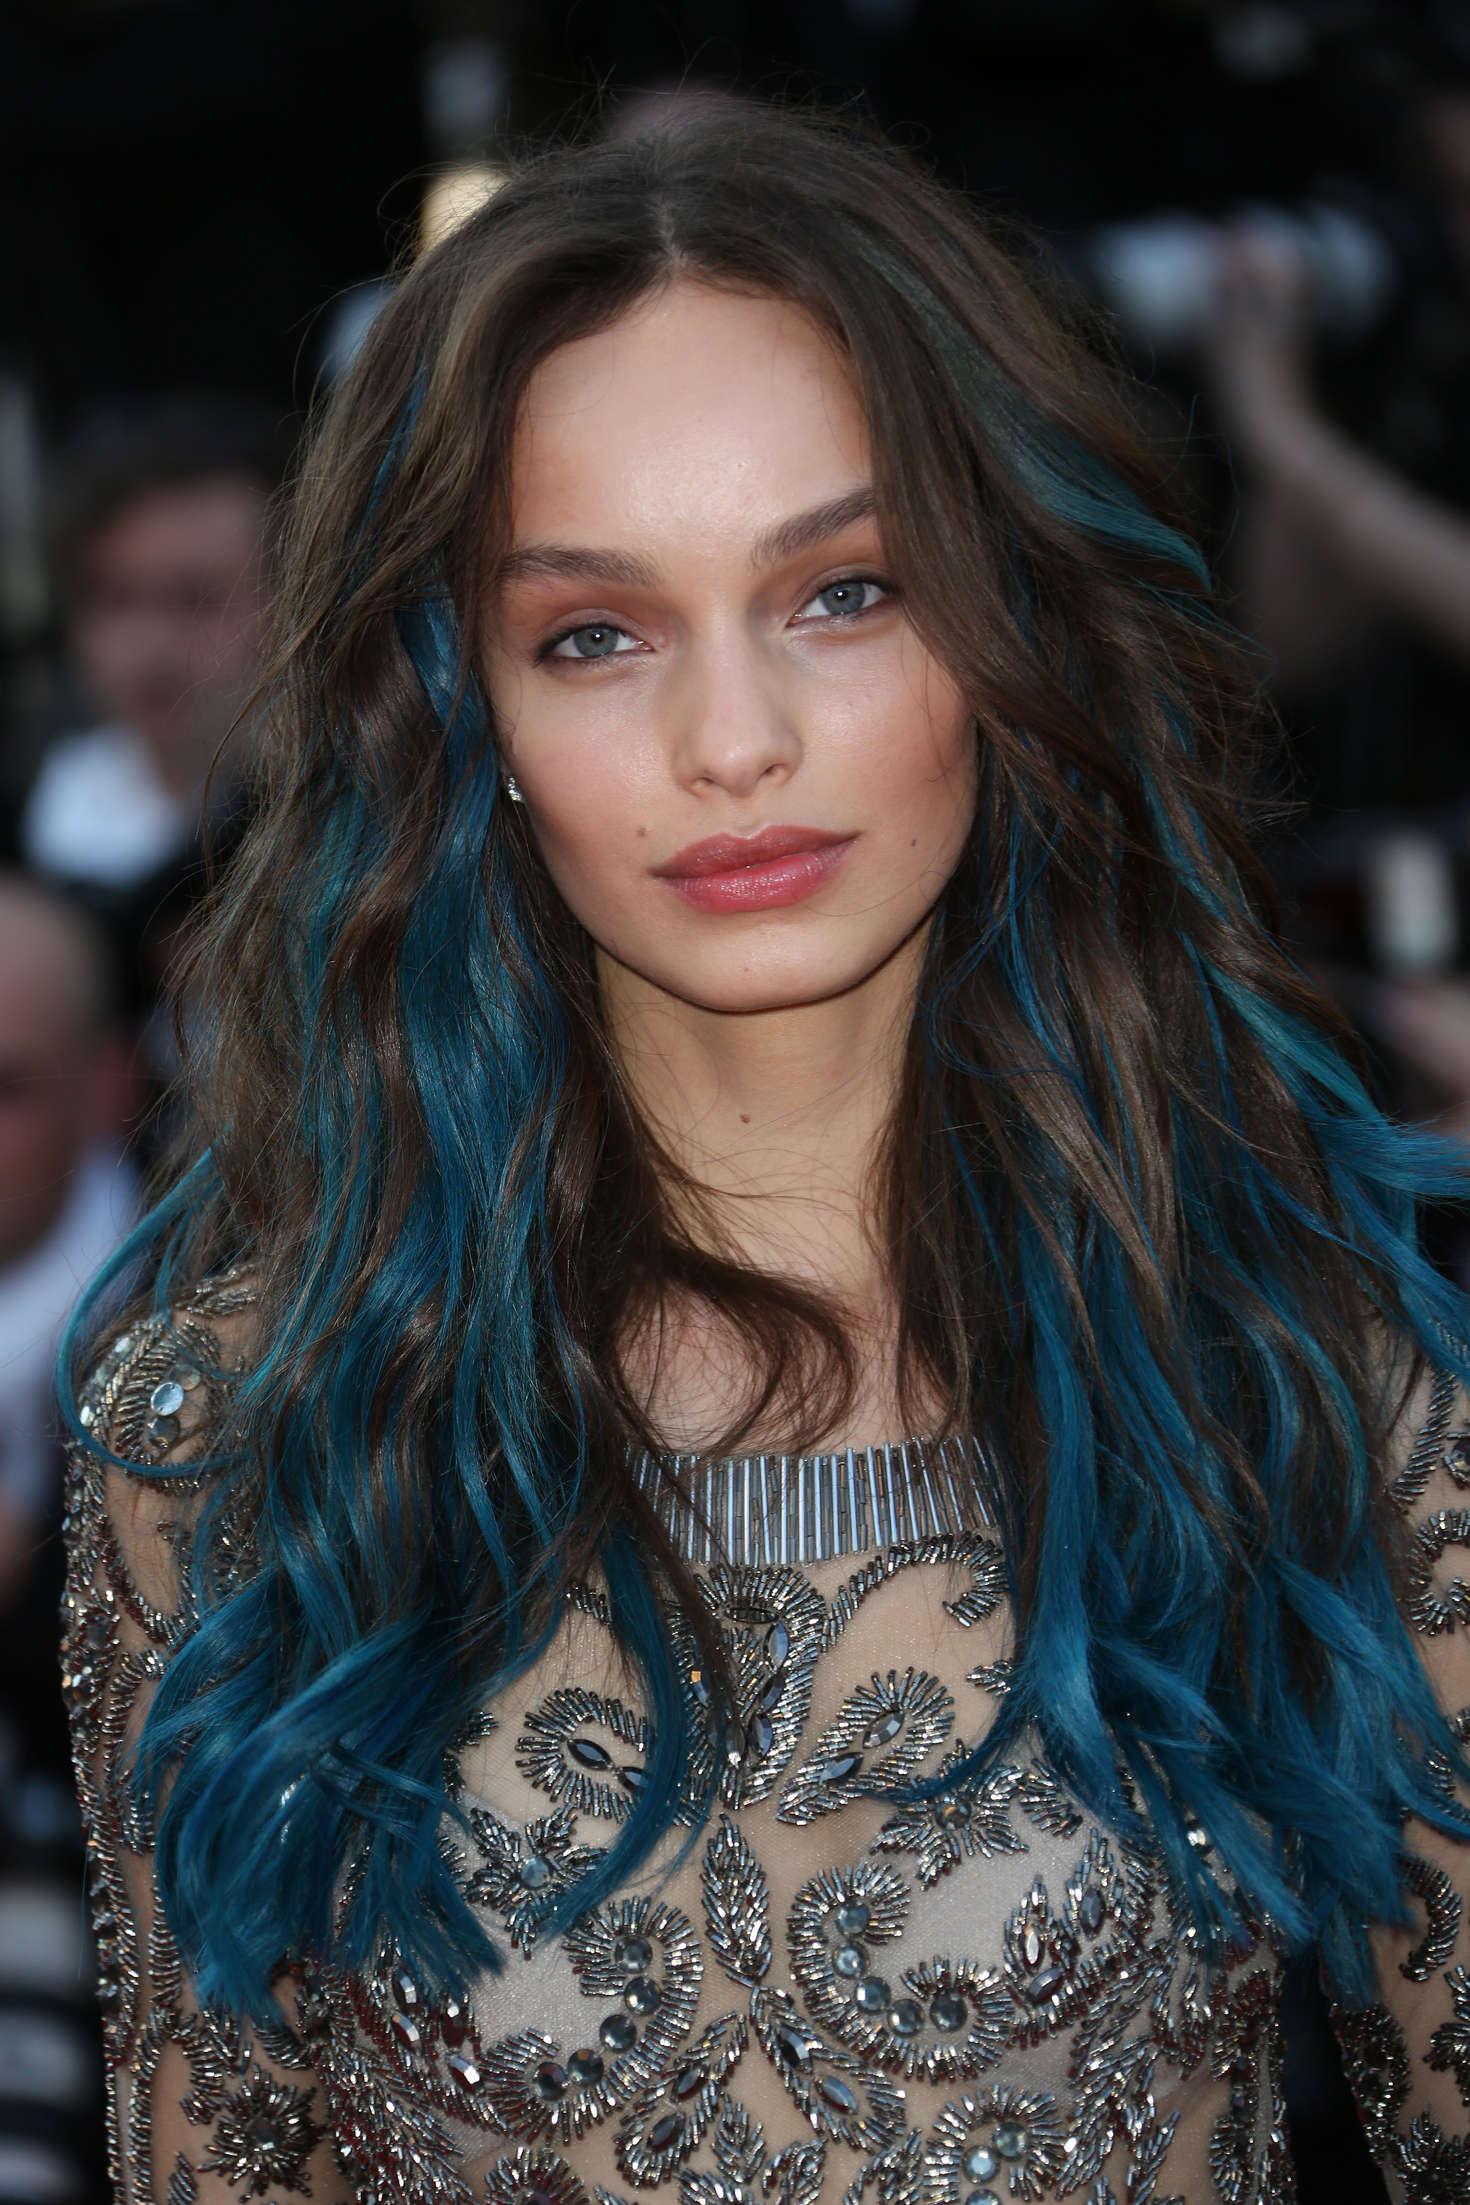 Luma Grothe Julieta Premiere At 2016 Cannes Film